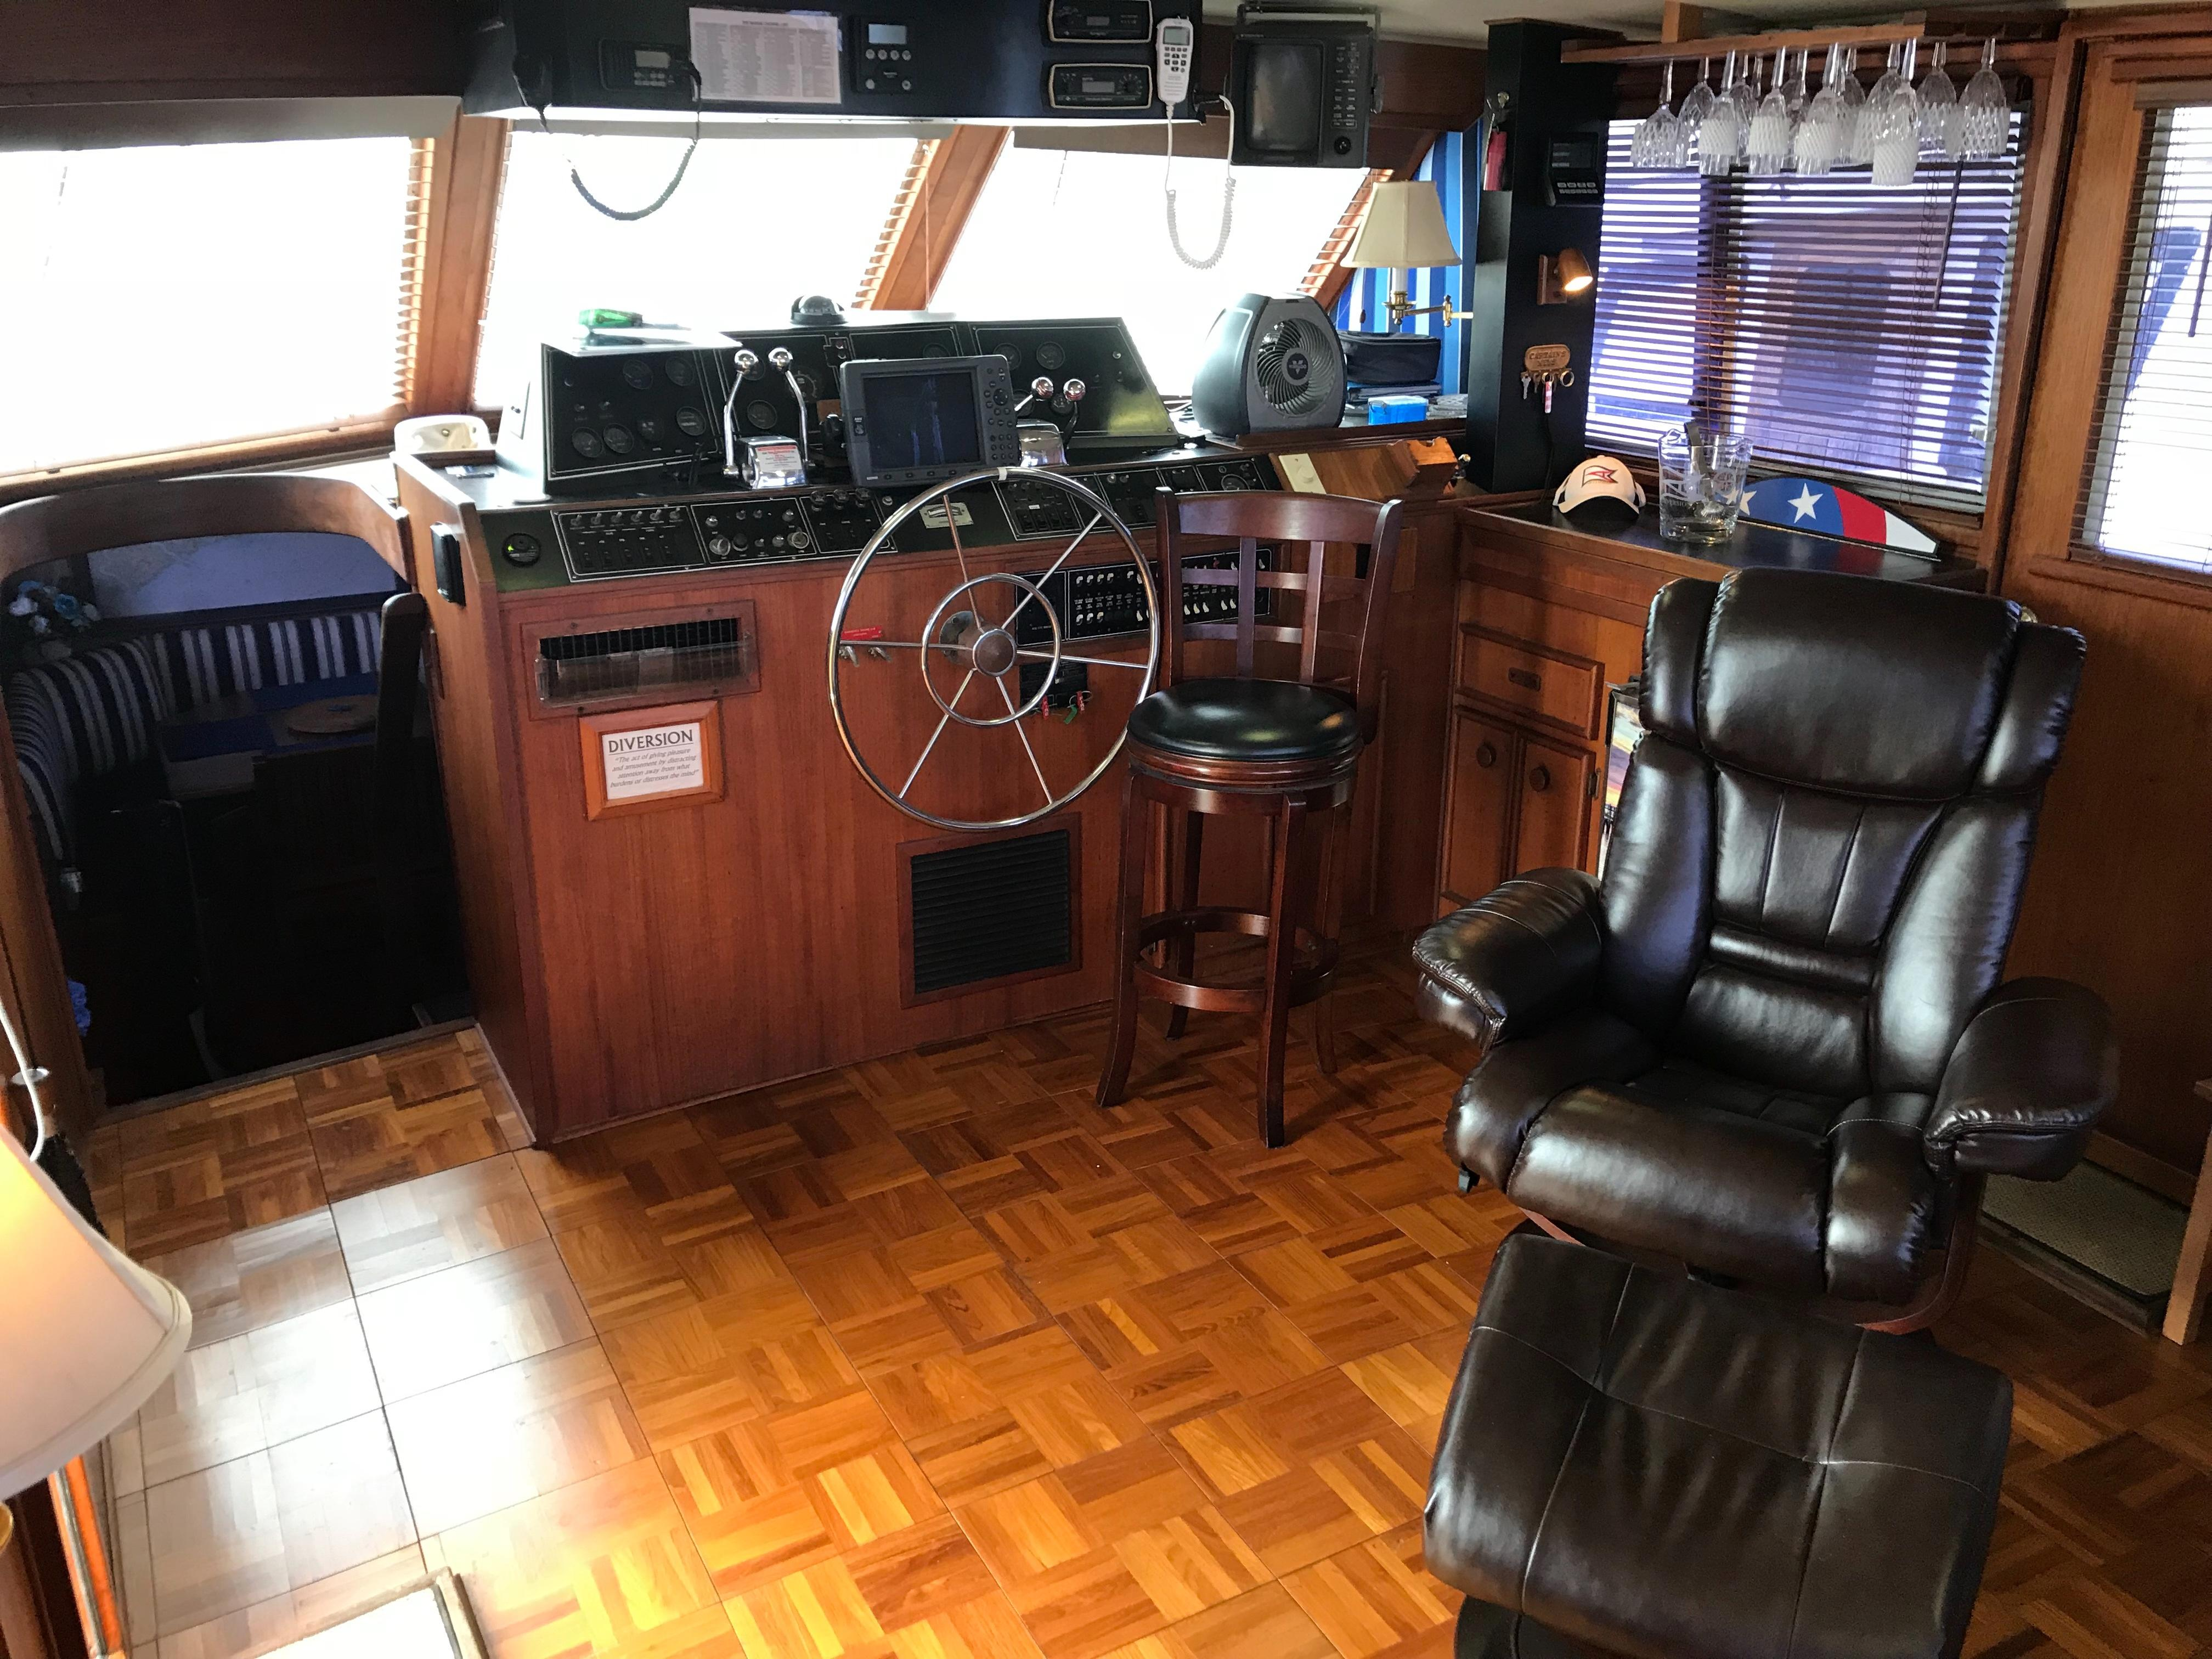 Chris-craft 46 Constellation - Upper Salon looking forward